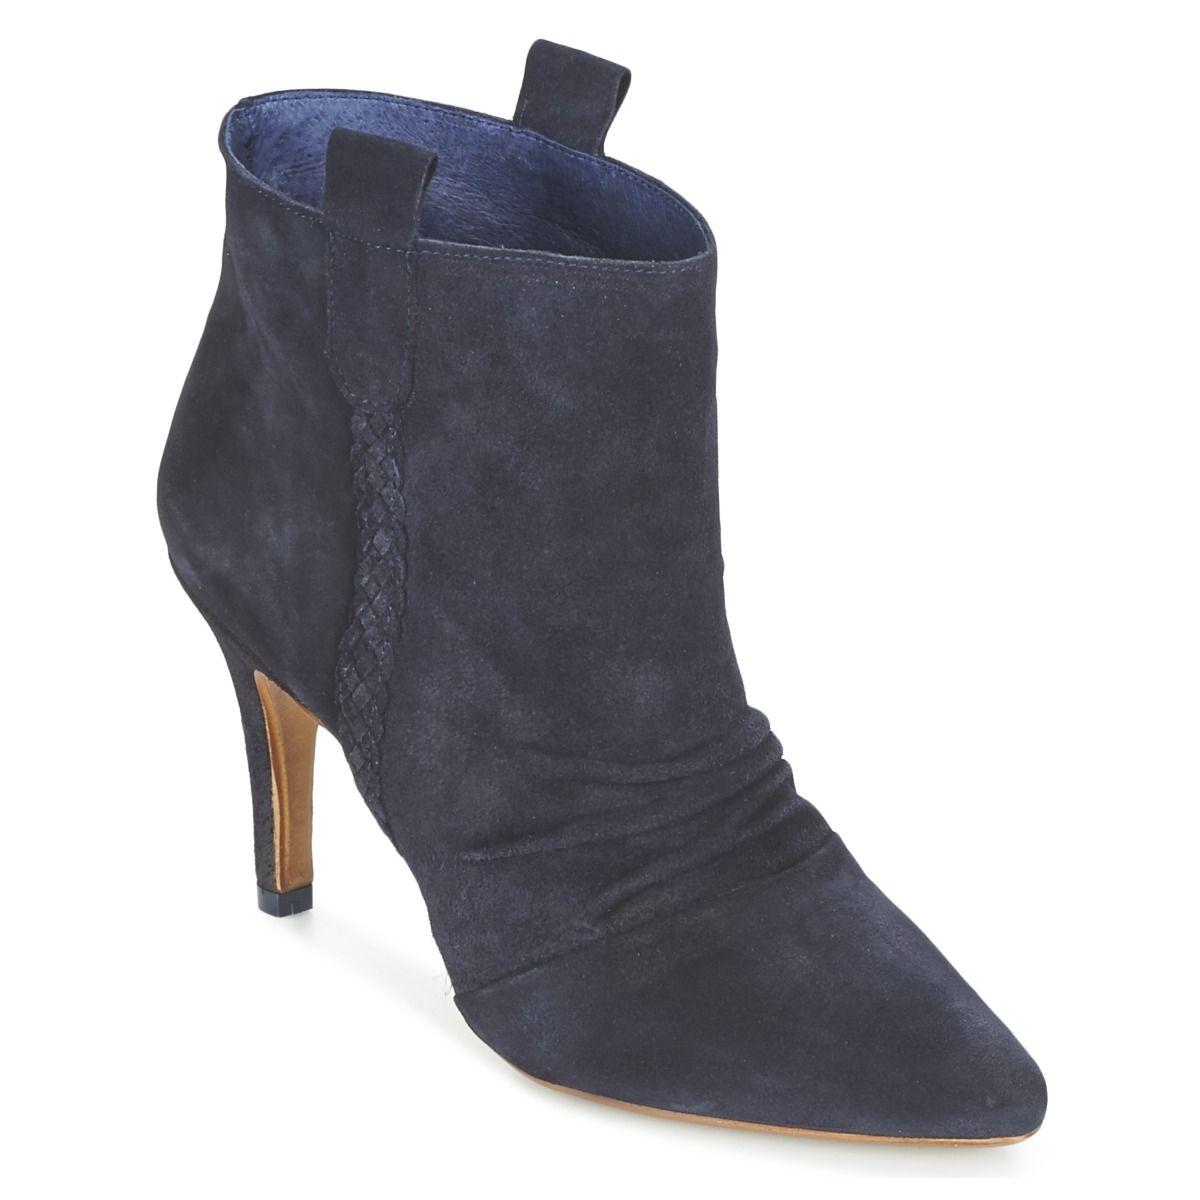 b1f73b42d06 Chaussures Bottines Tresse Ikks Cher Miranda Pinterest Marine Pas xwzIwr